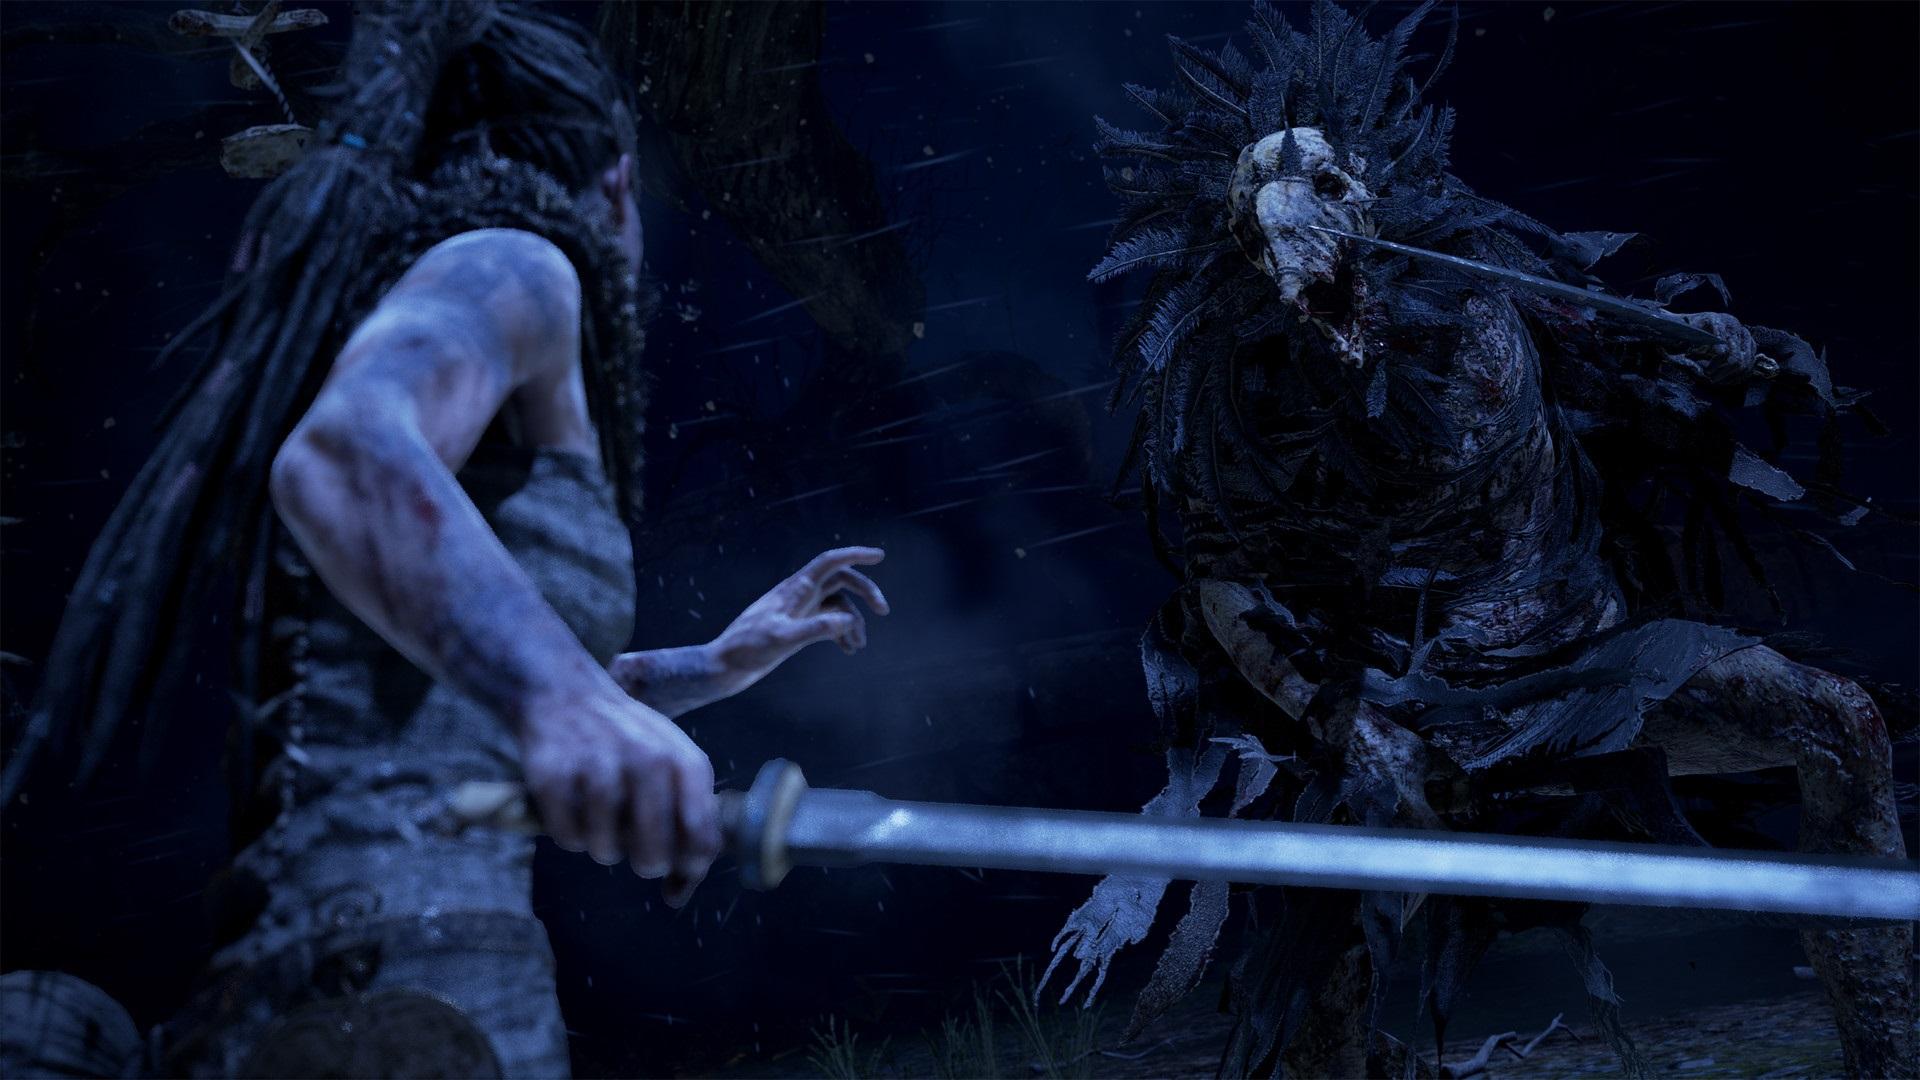 hellblade-senuas-sacrifice-pc-screenshot-04